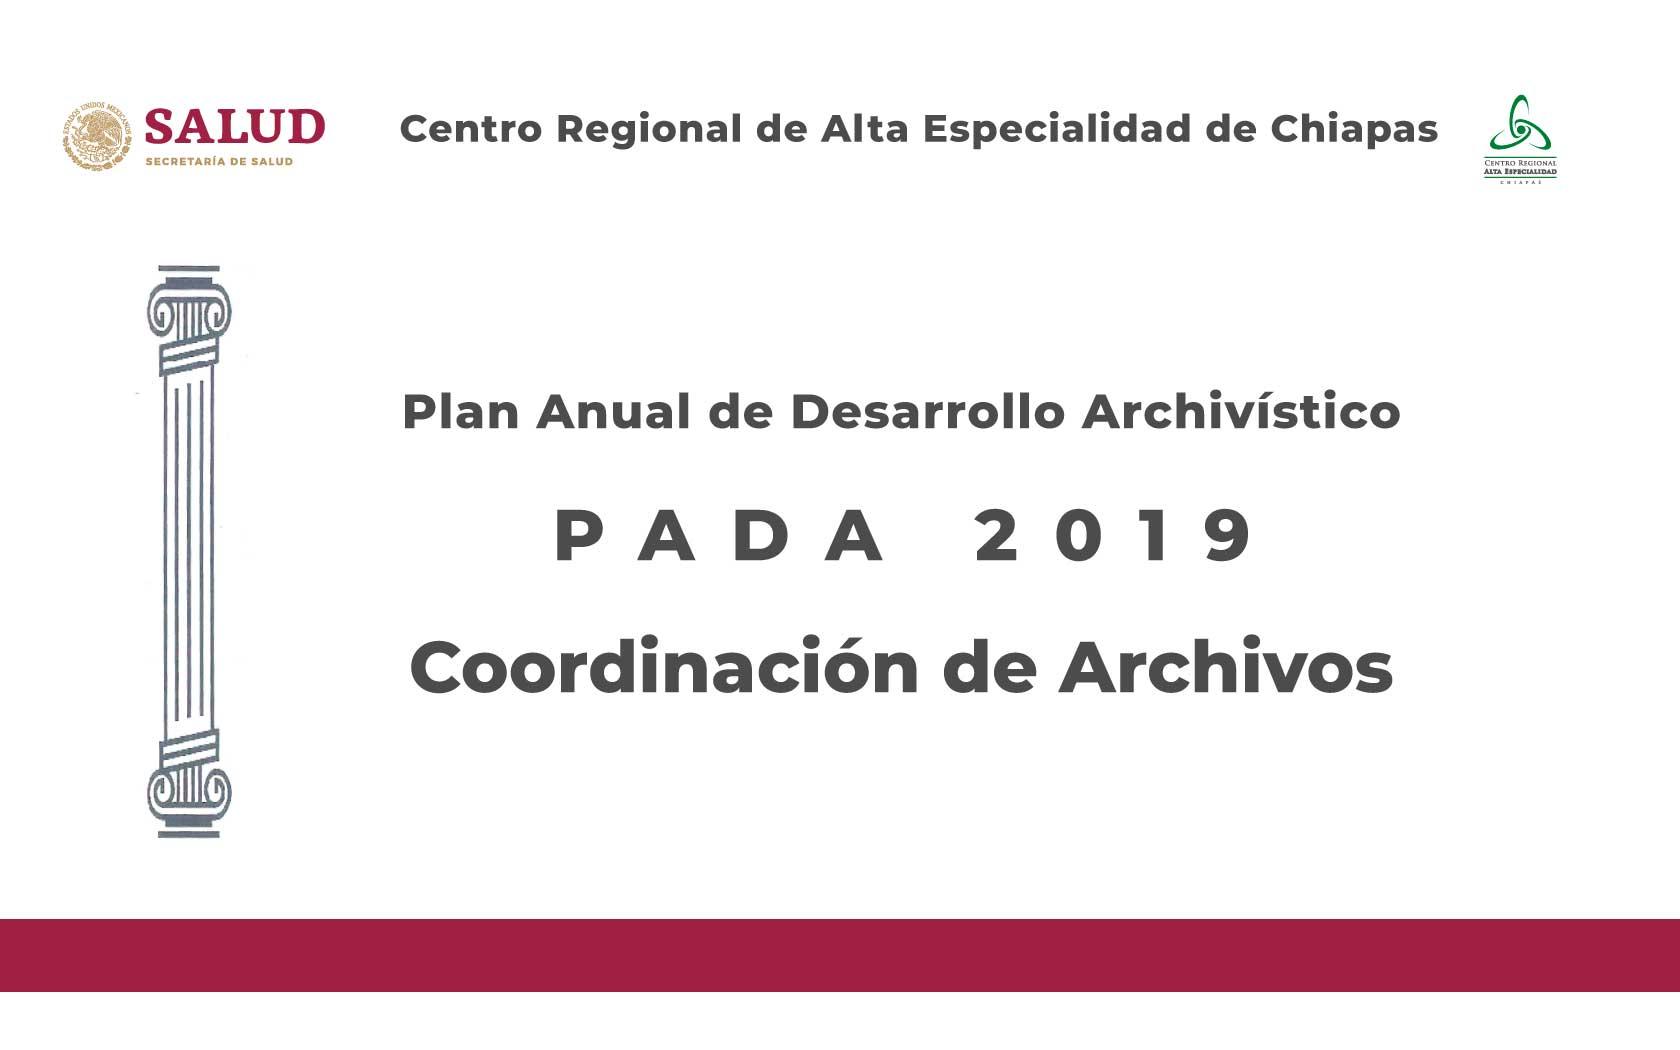 PADA 2019